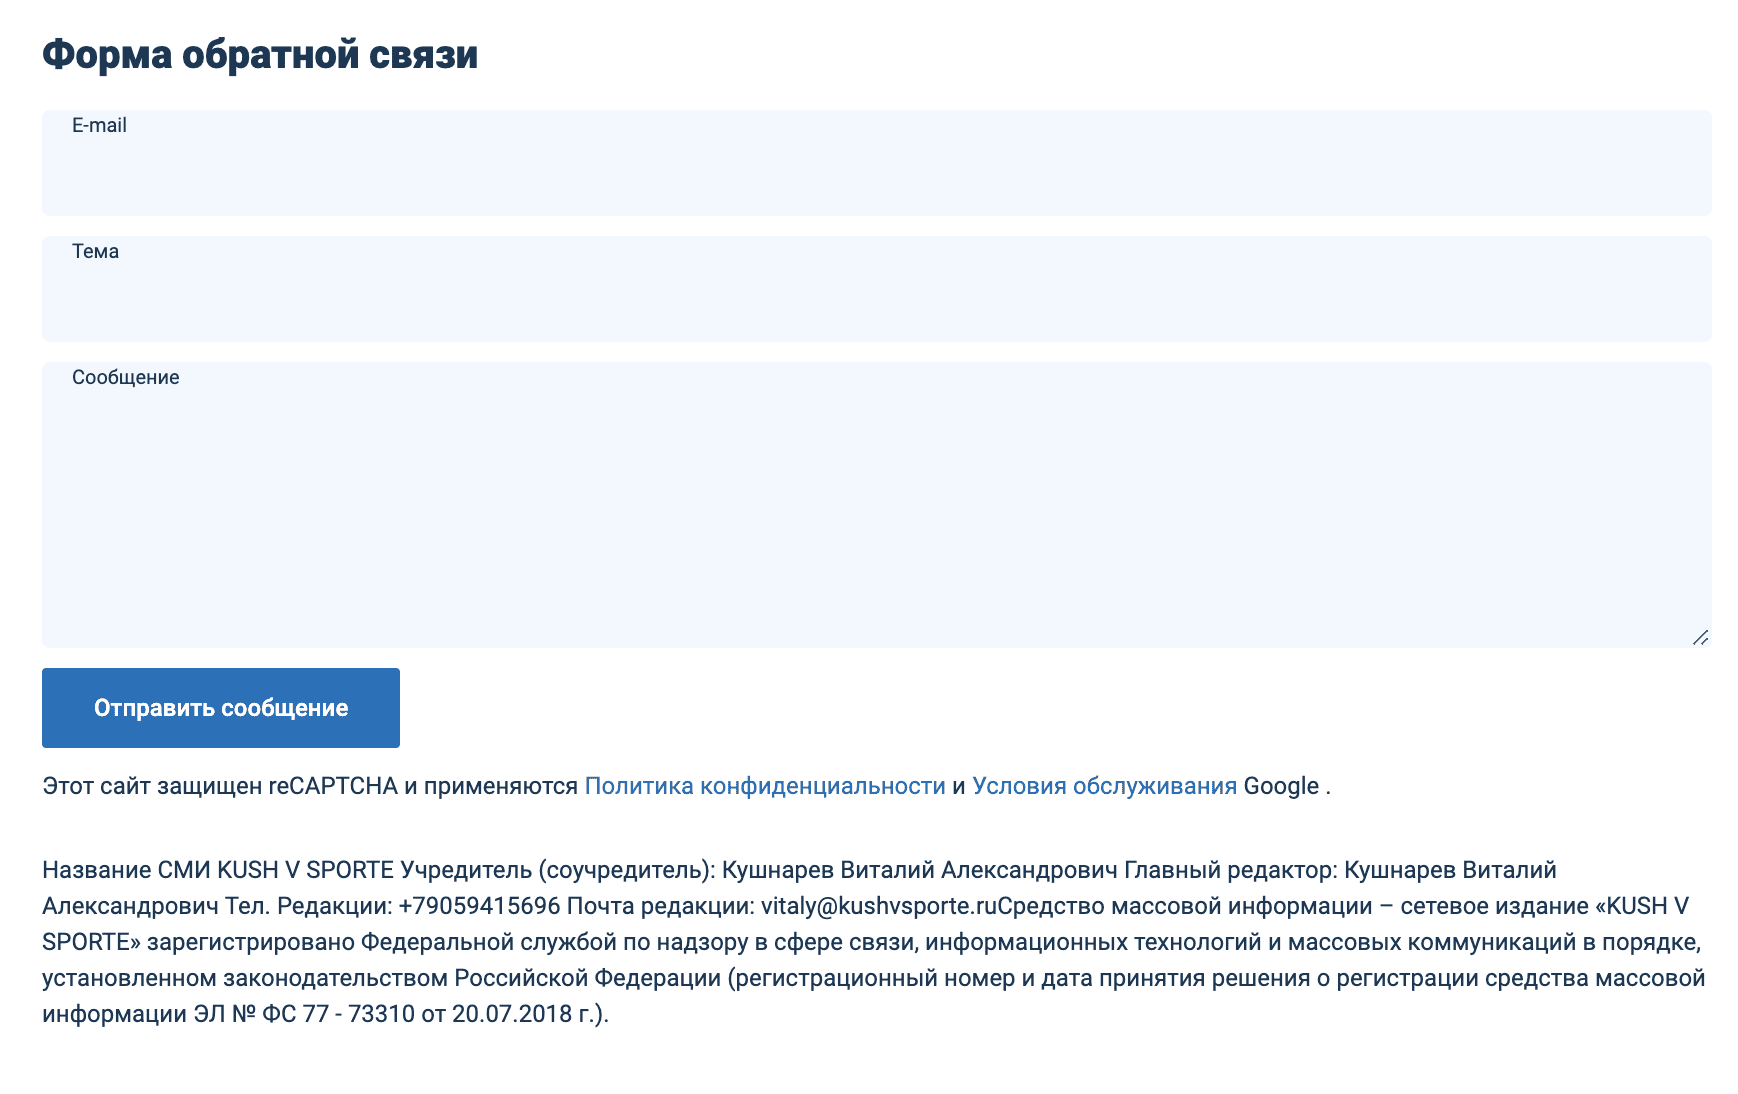 Обратная связь на сайте Kushvsporte ru (Кушвспорте ру)